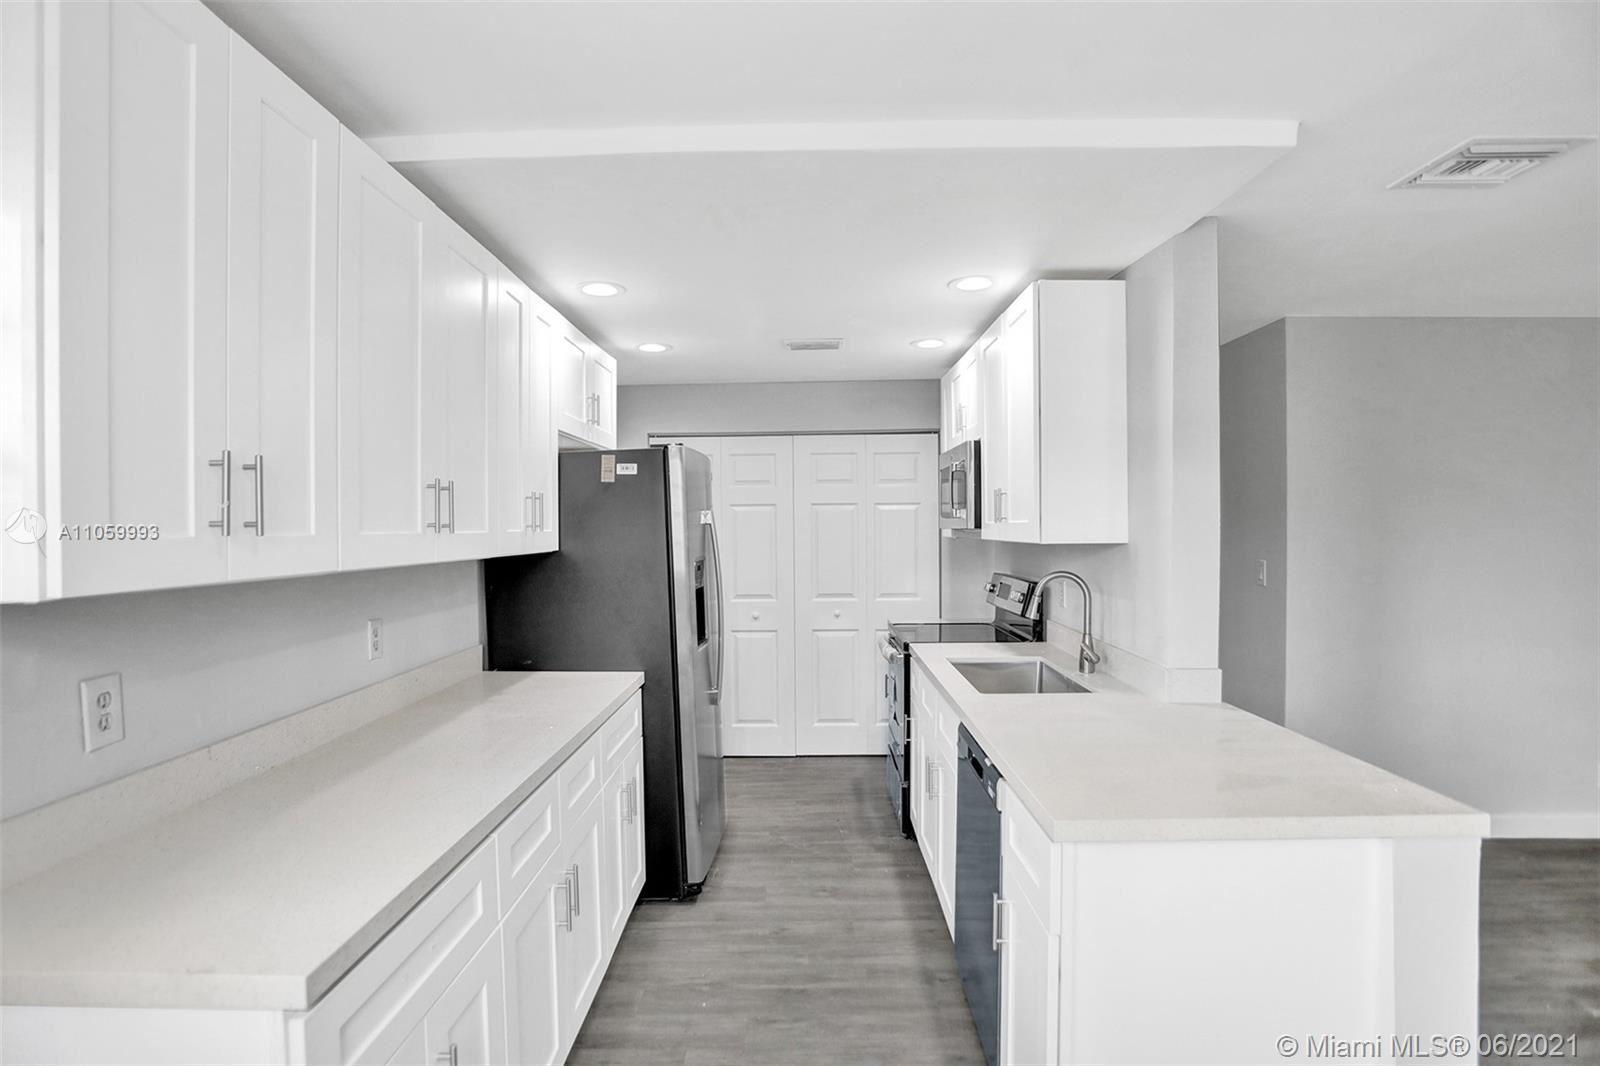 6035 Winfield Blvd, Margate, FL 33063 - #: A11059993